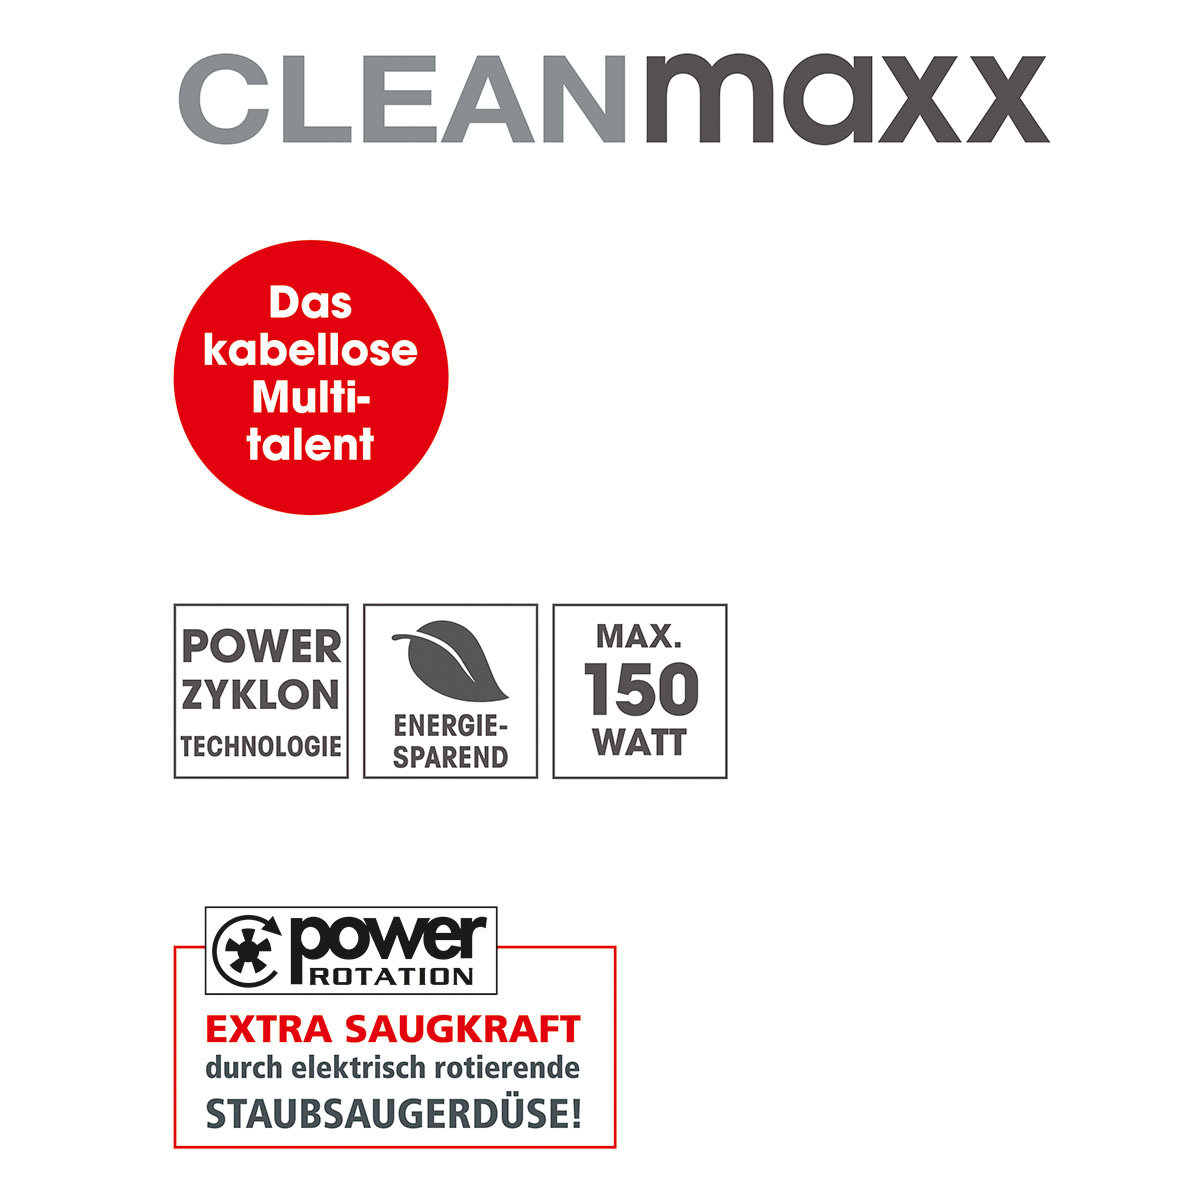 CLEANmaxx Akku-Zyklonstaubsauger | #7